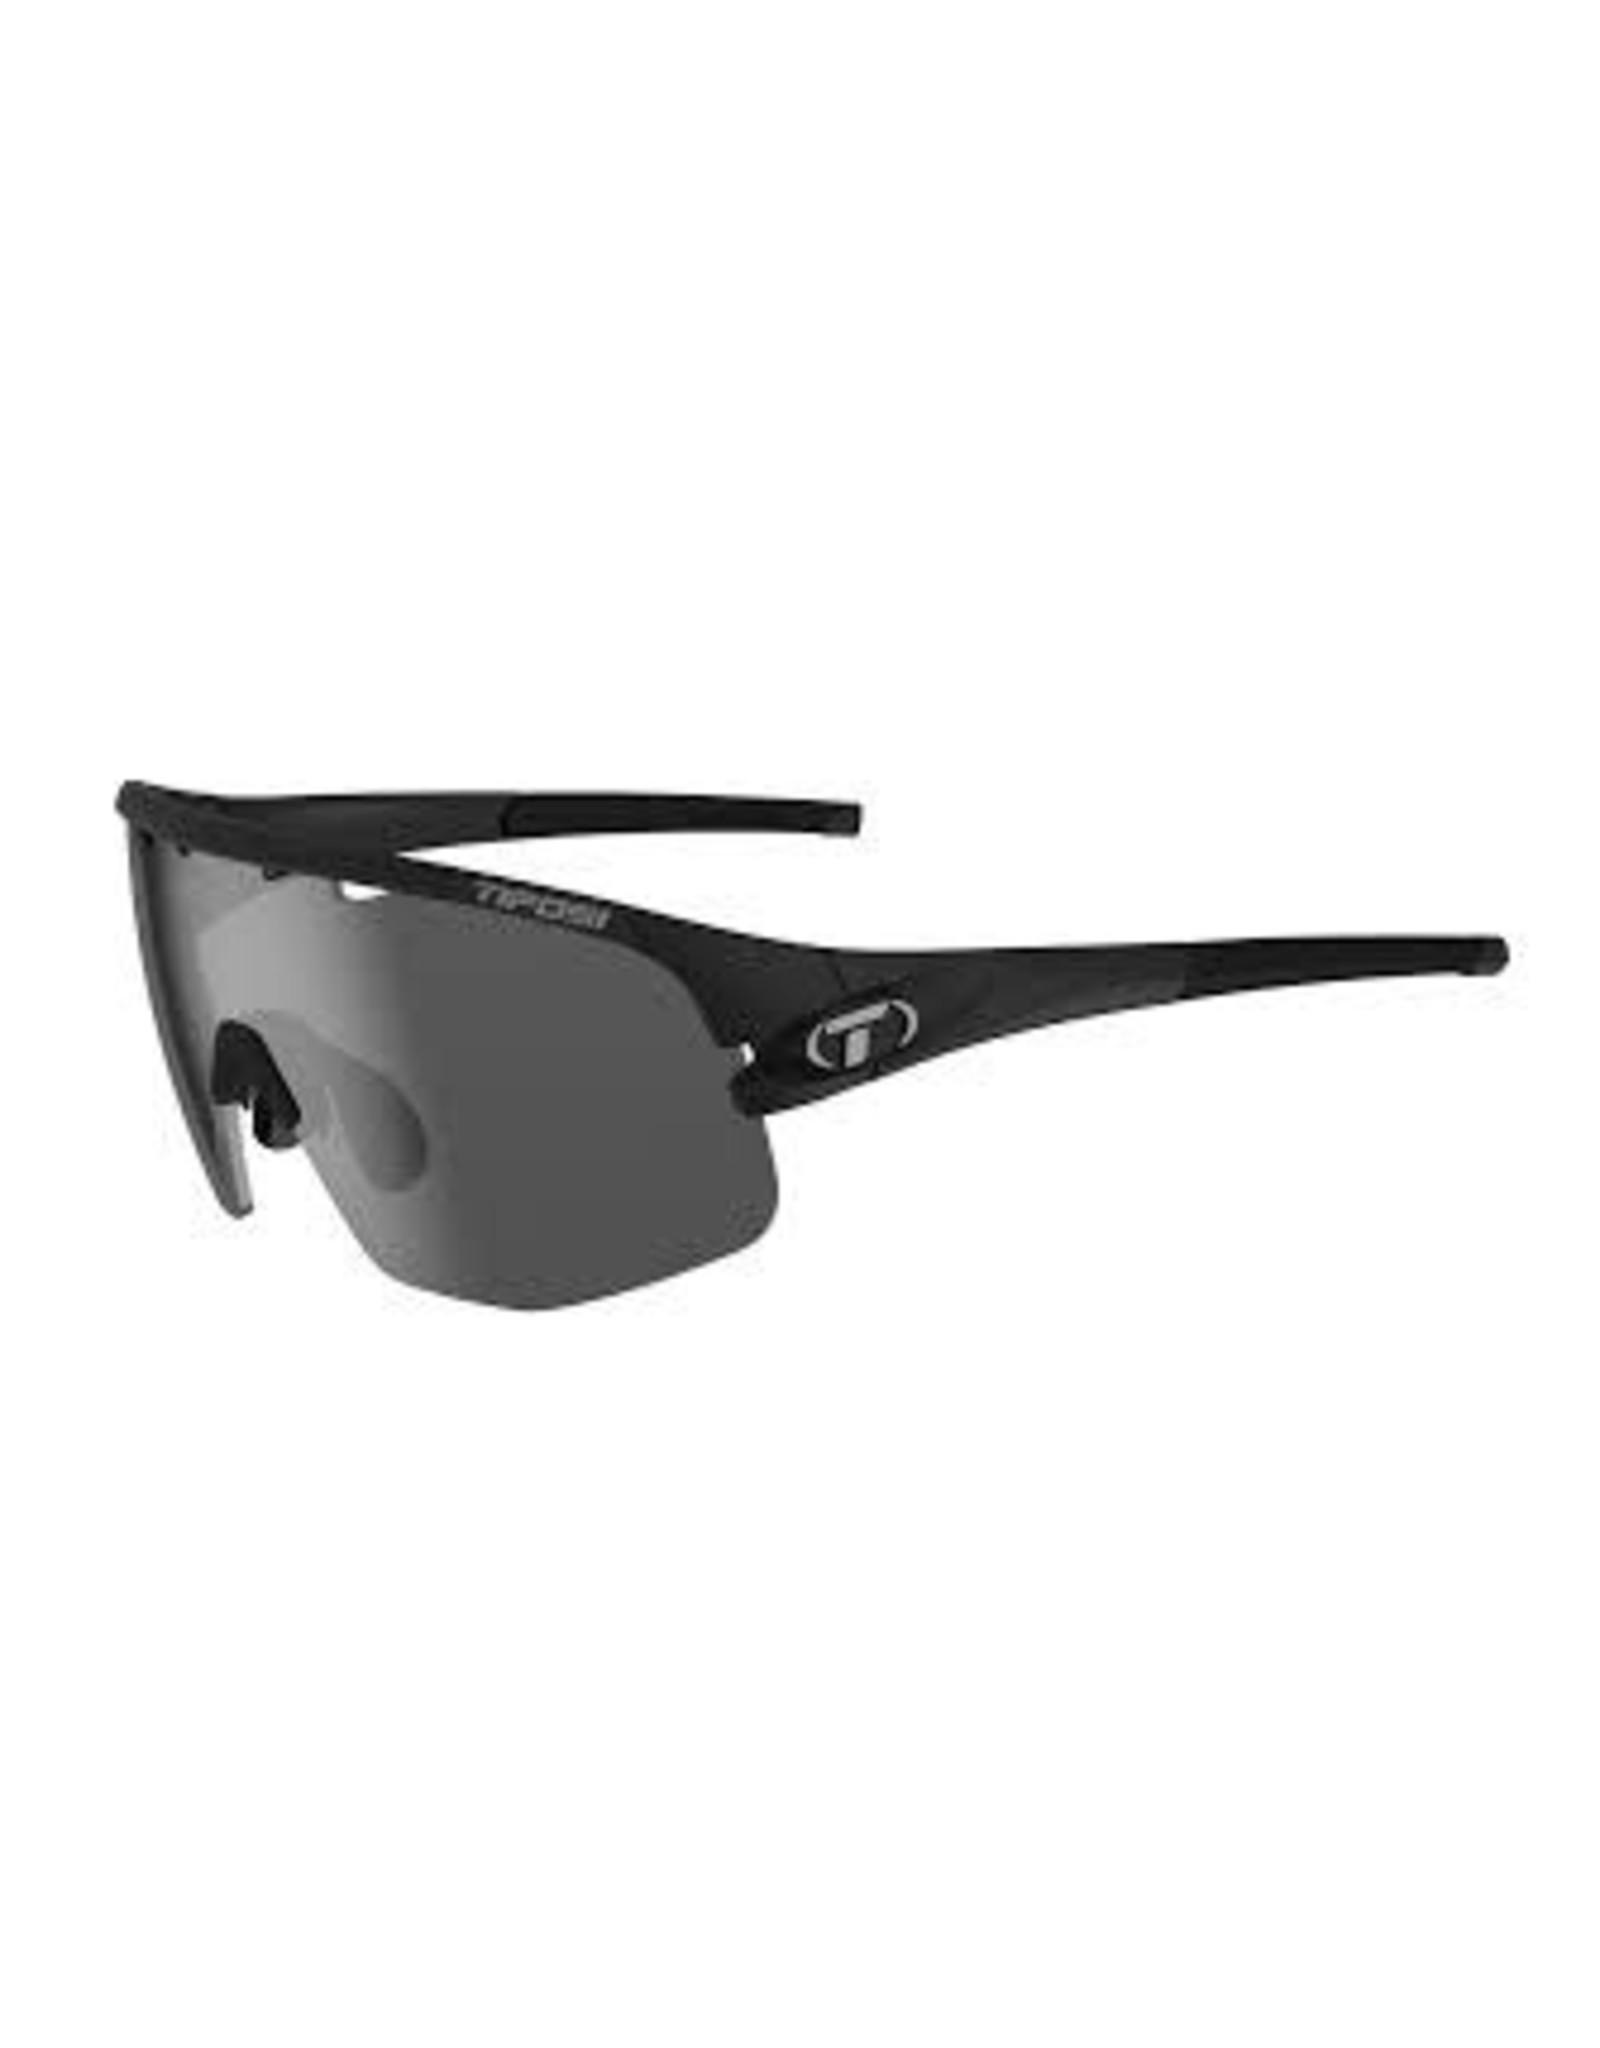 Tifosi Optics Sunlglass Tifosi Sledge Lite Matte Black Interchangeable